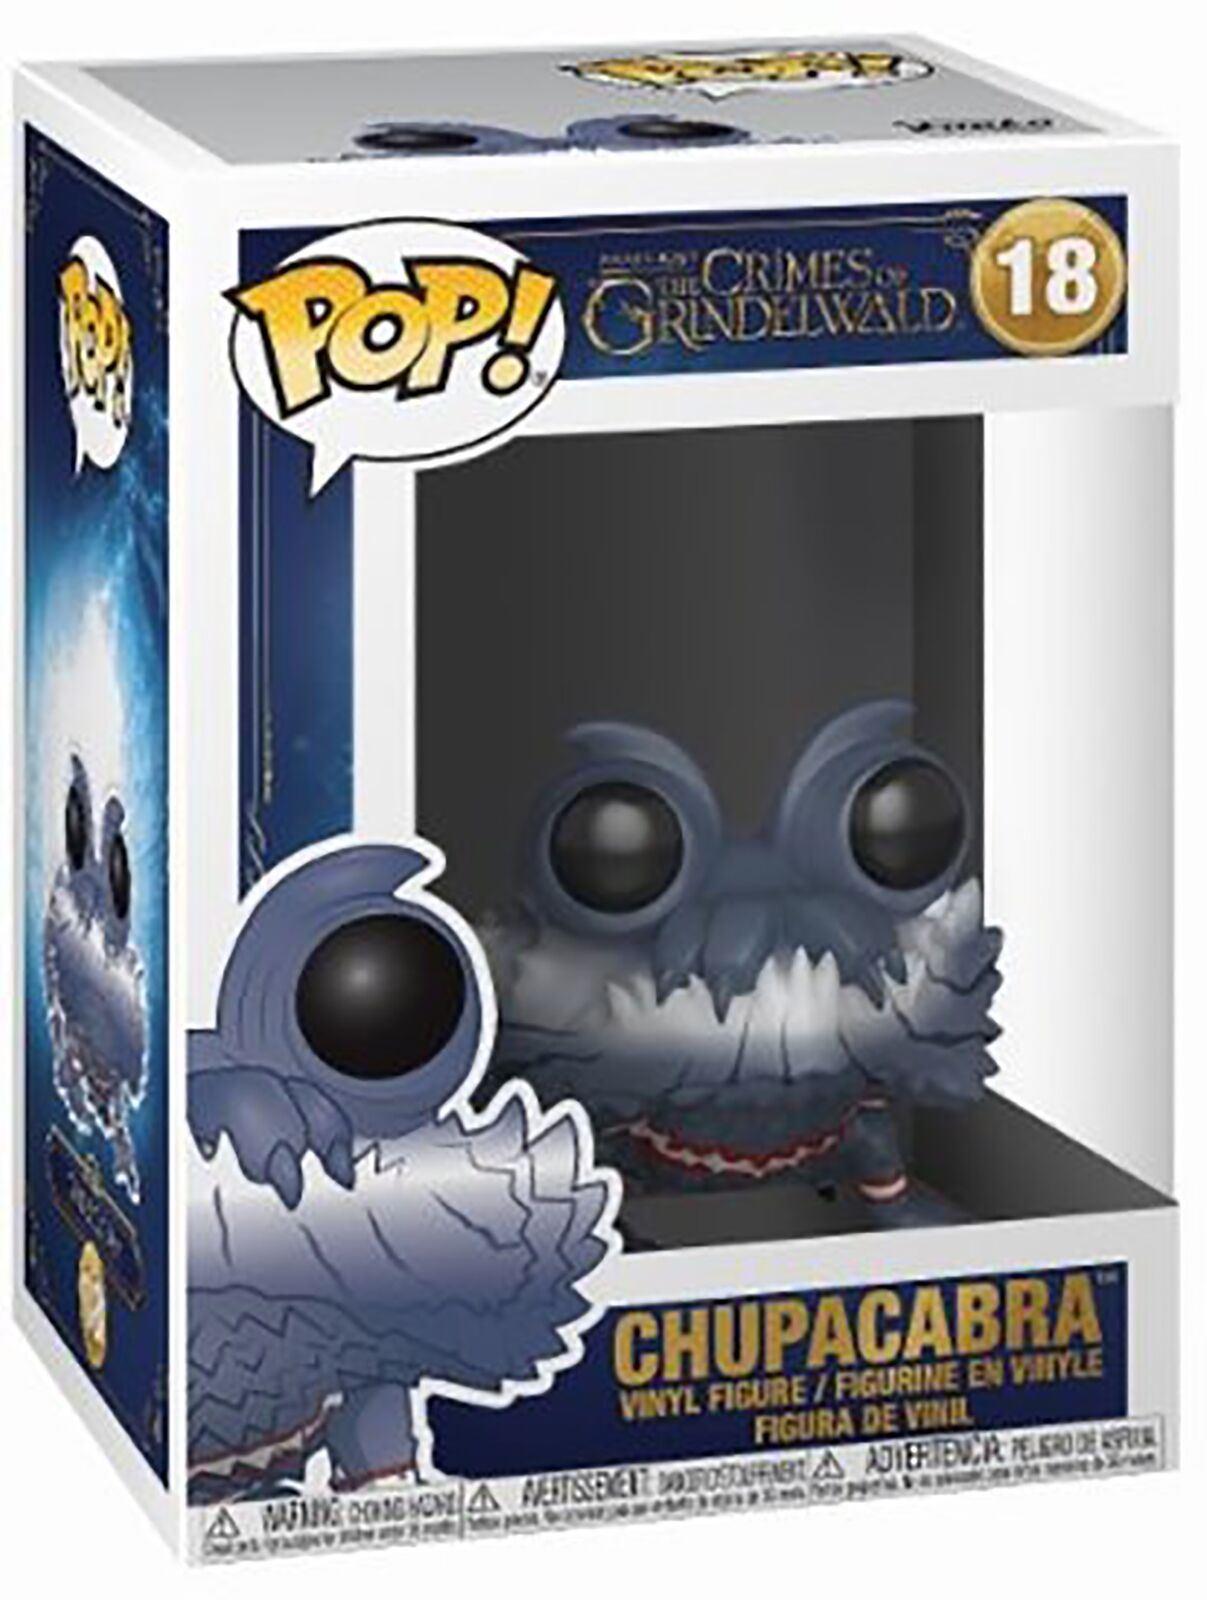 Vinyl Fantastic Beasts 2 Chupacabra #18 Collectable Figure Funko Pop